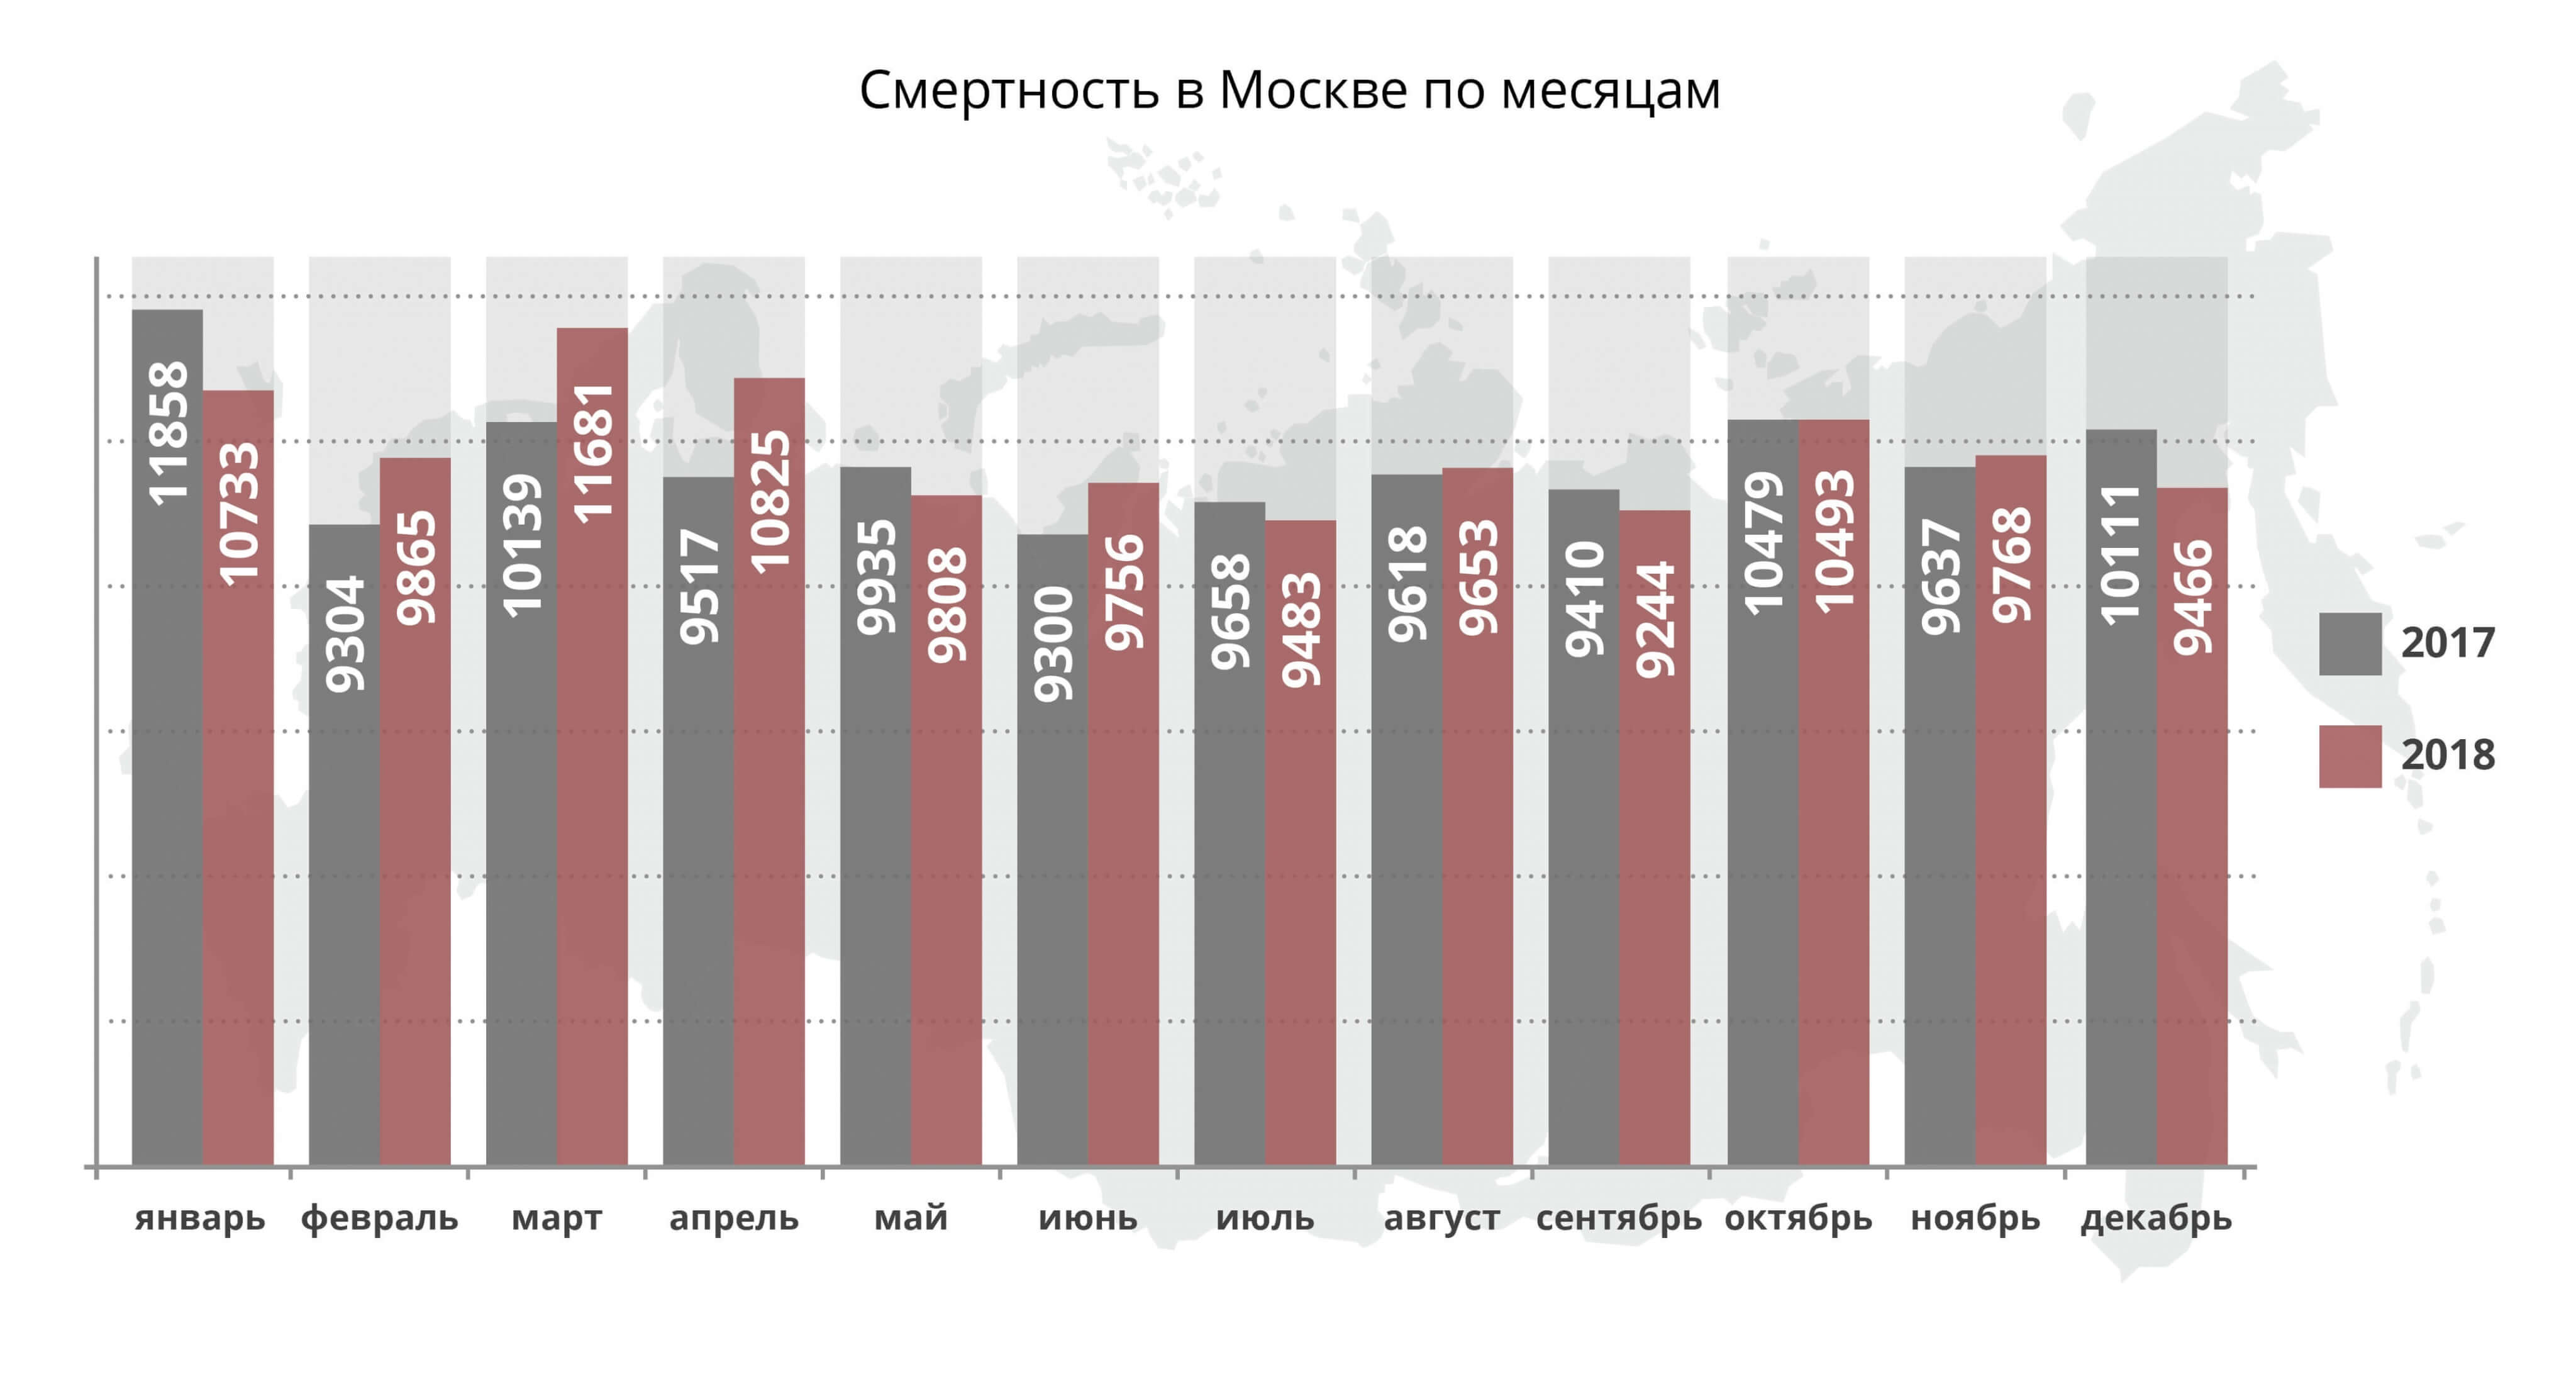 Статистика смертности в Москве